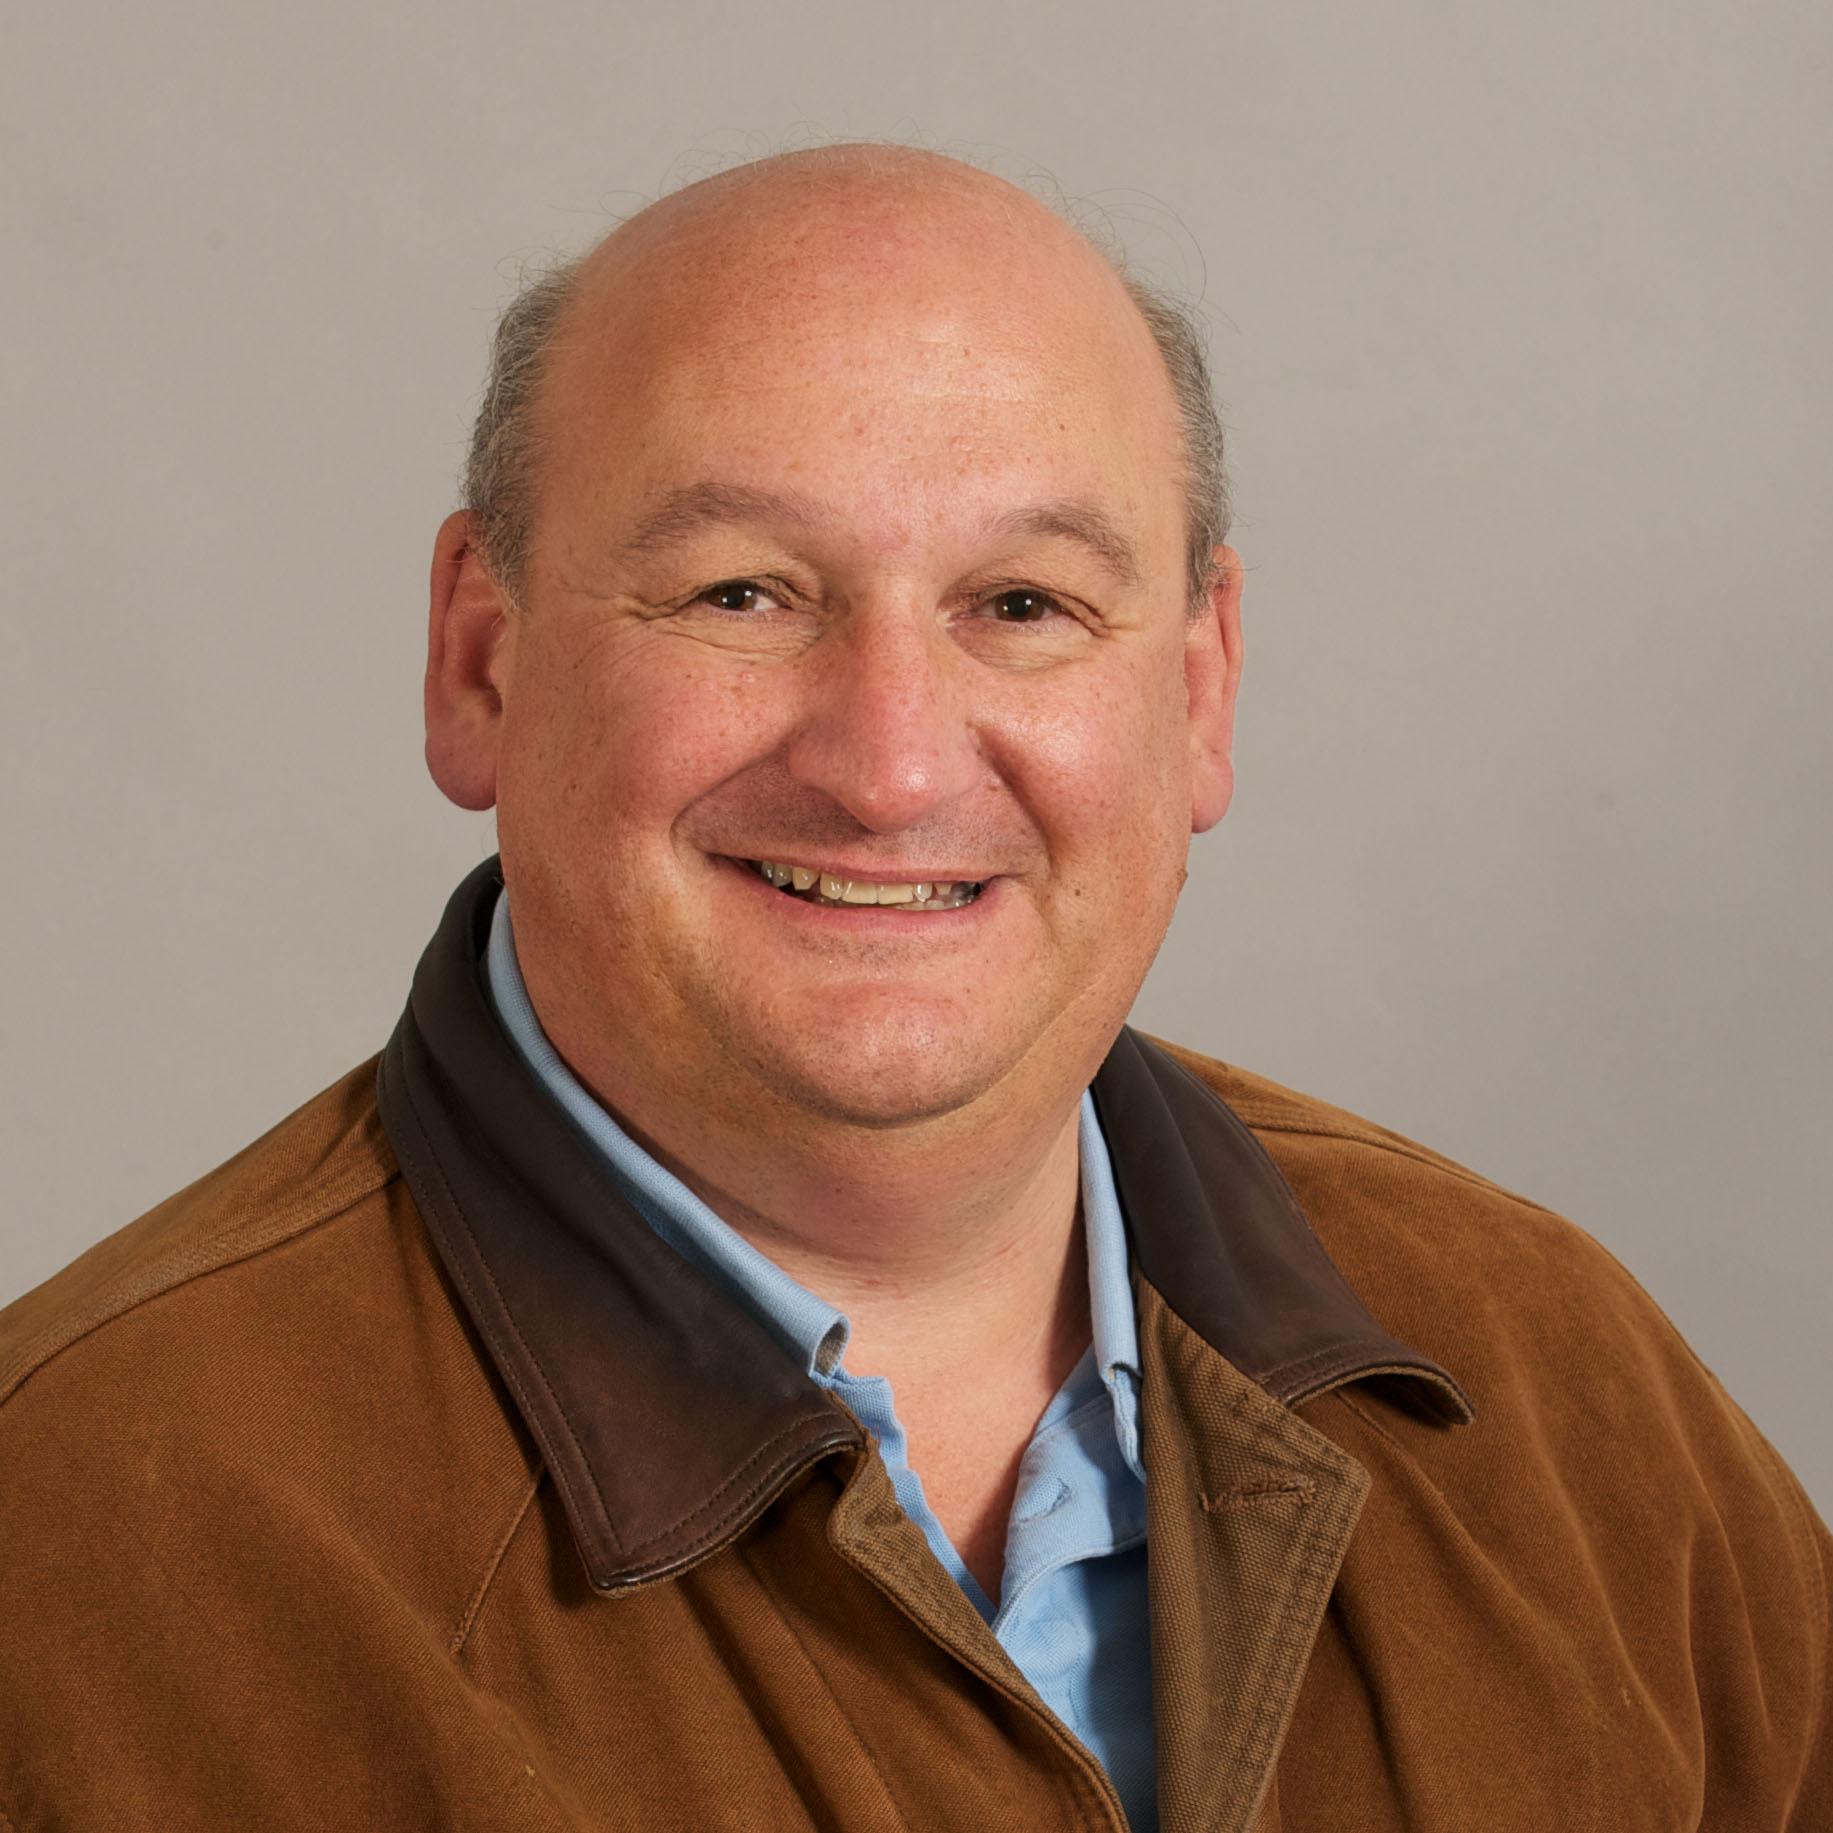 Philip Rowe